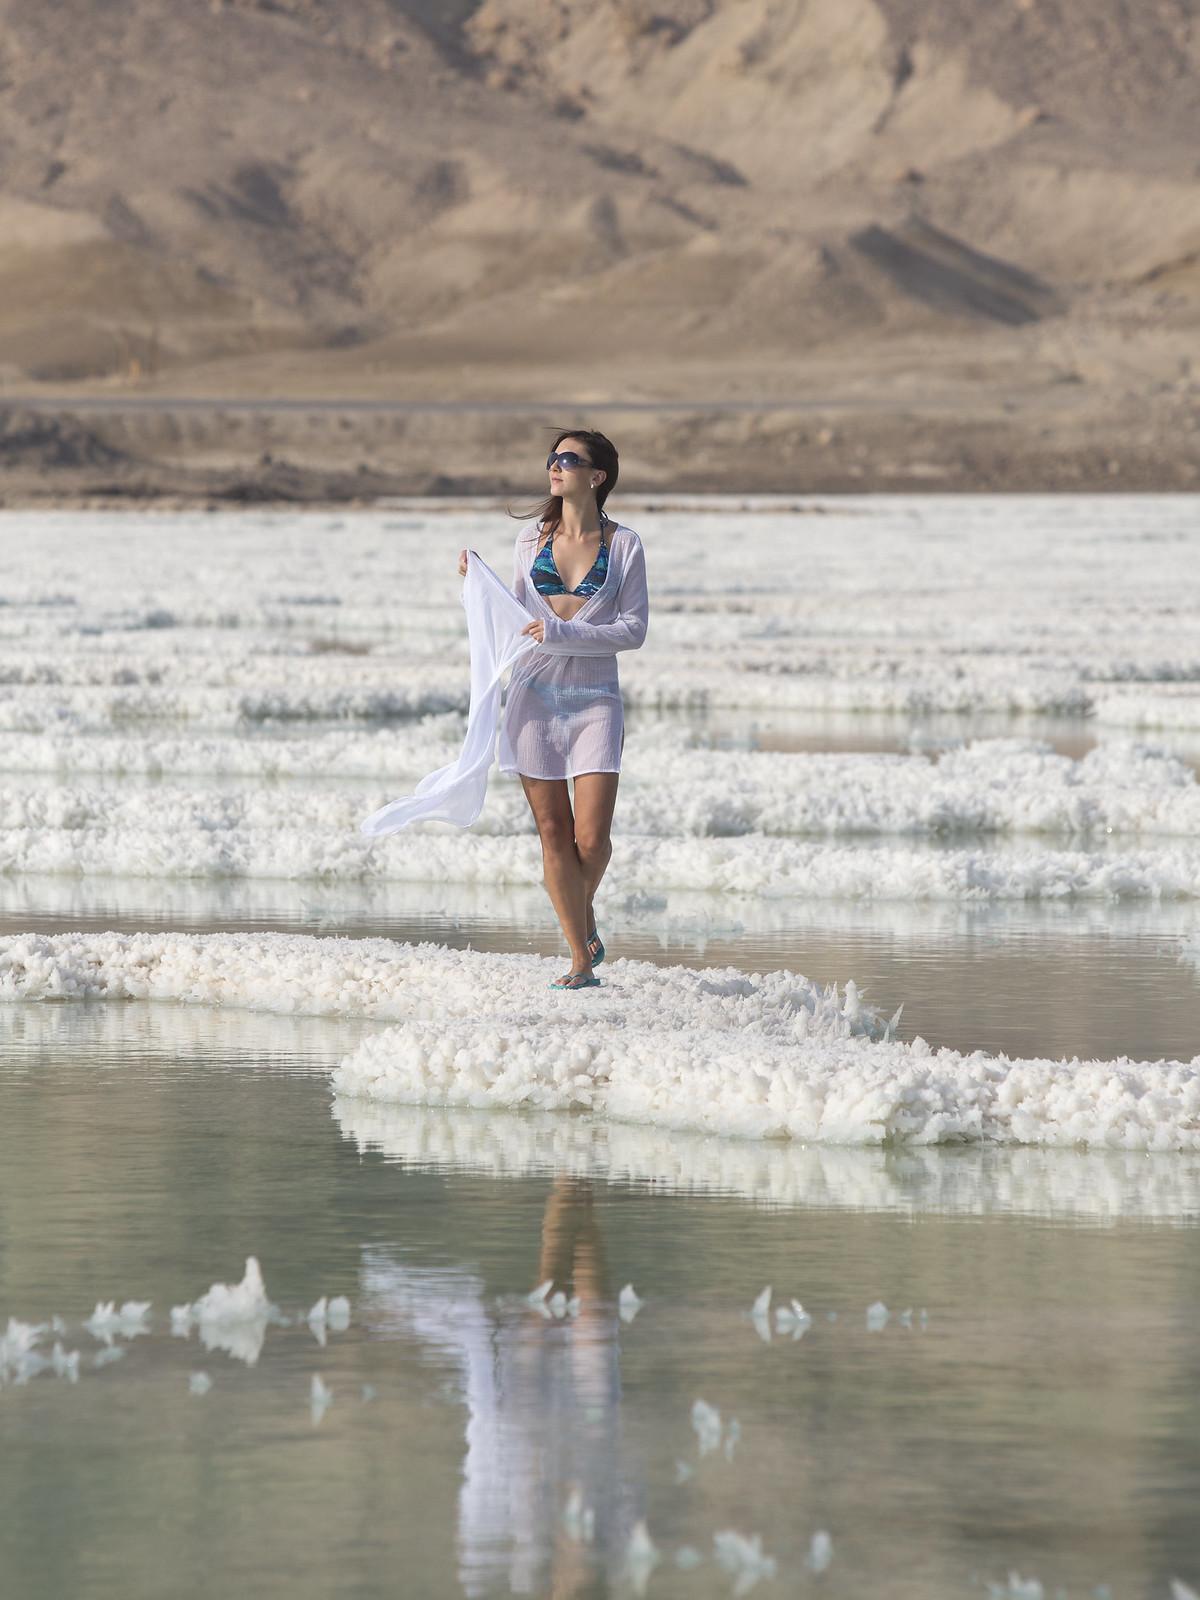 Salt 5_DS12IG5378_Dead Sea_Itamar Grinberg_IMOT